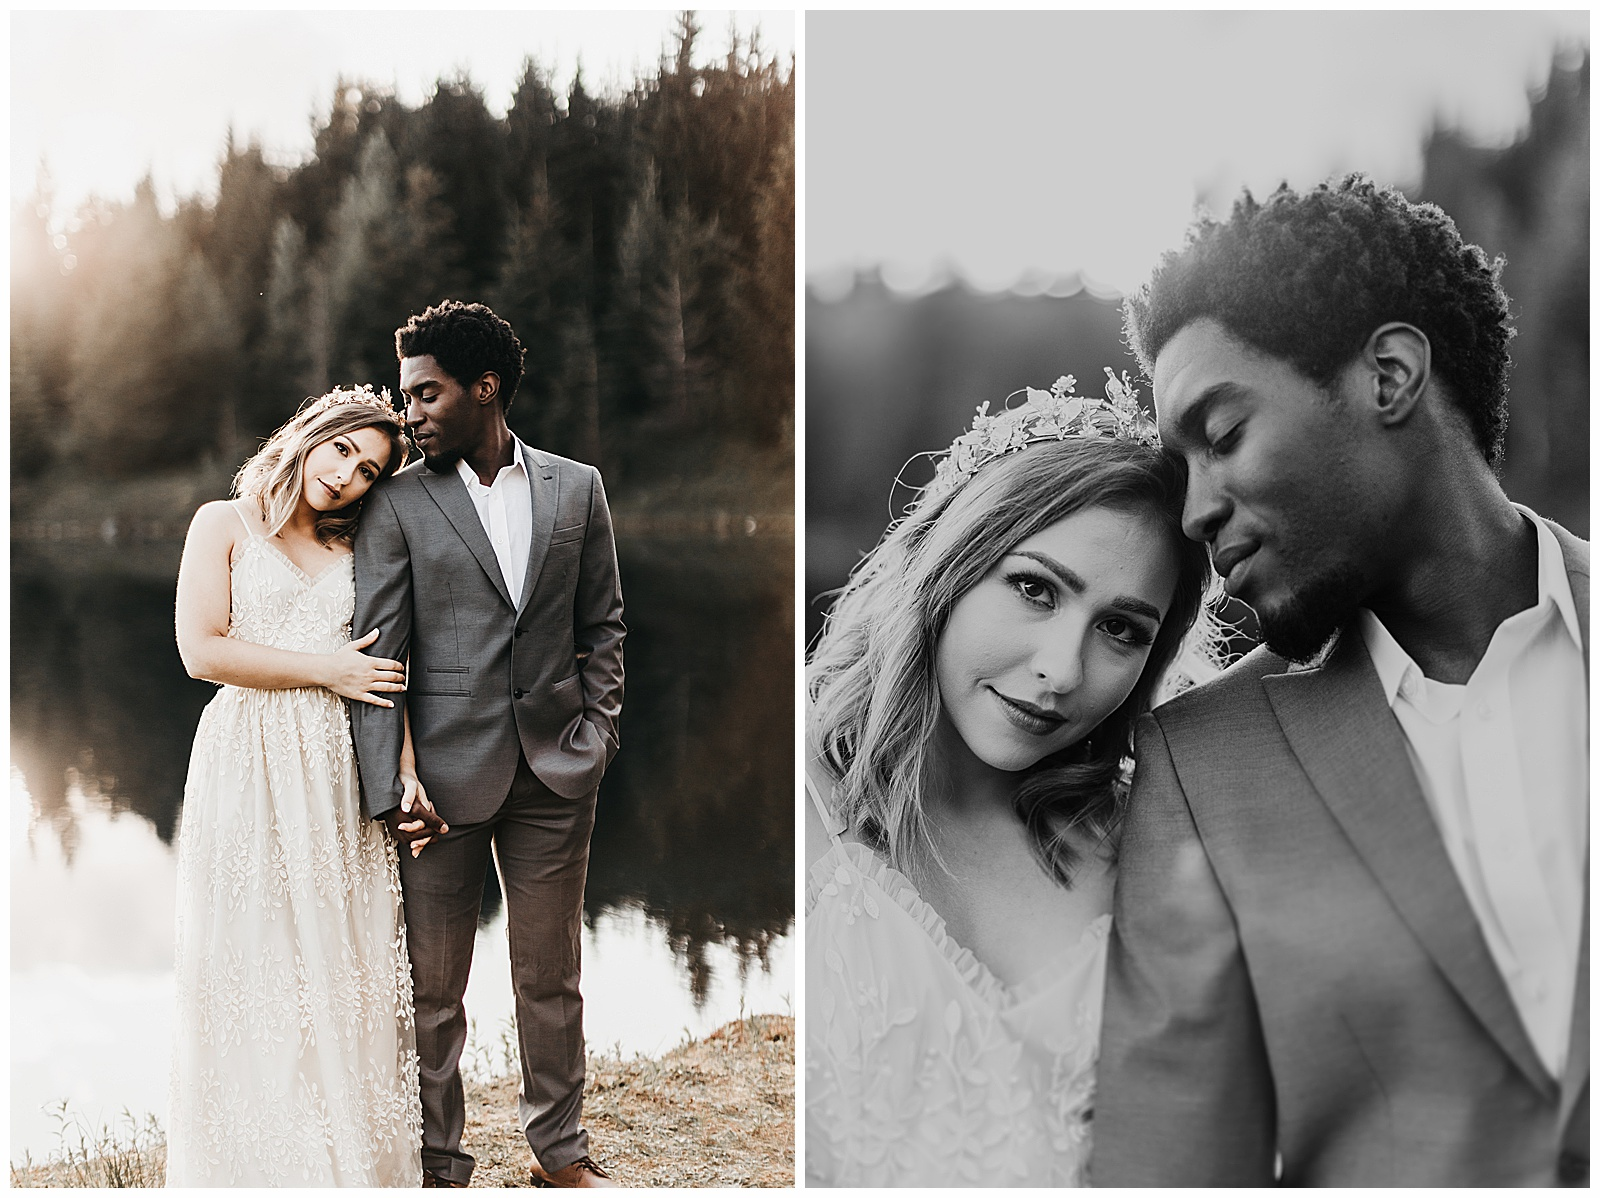 seattle-wedding-photographer-seattle-elopement-photographer-anniezav_0024.jpg